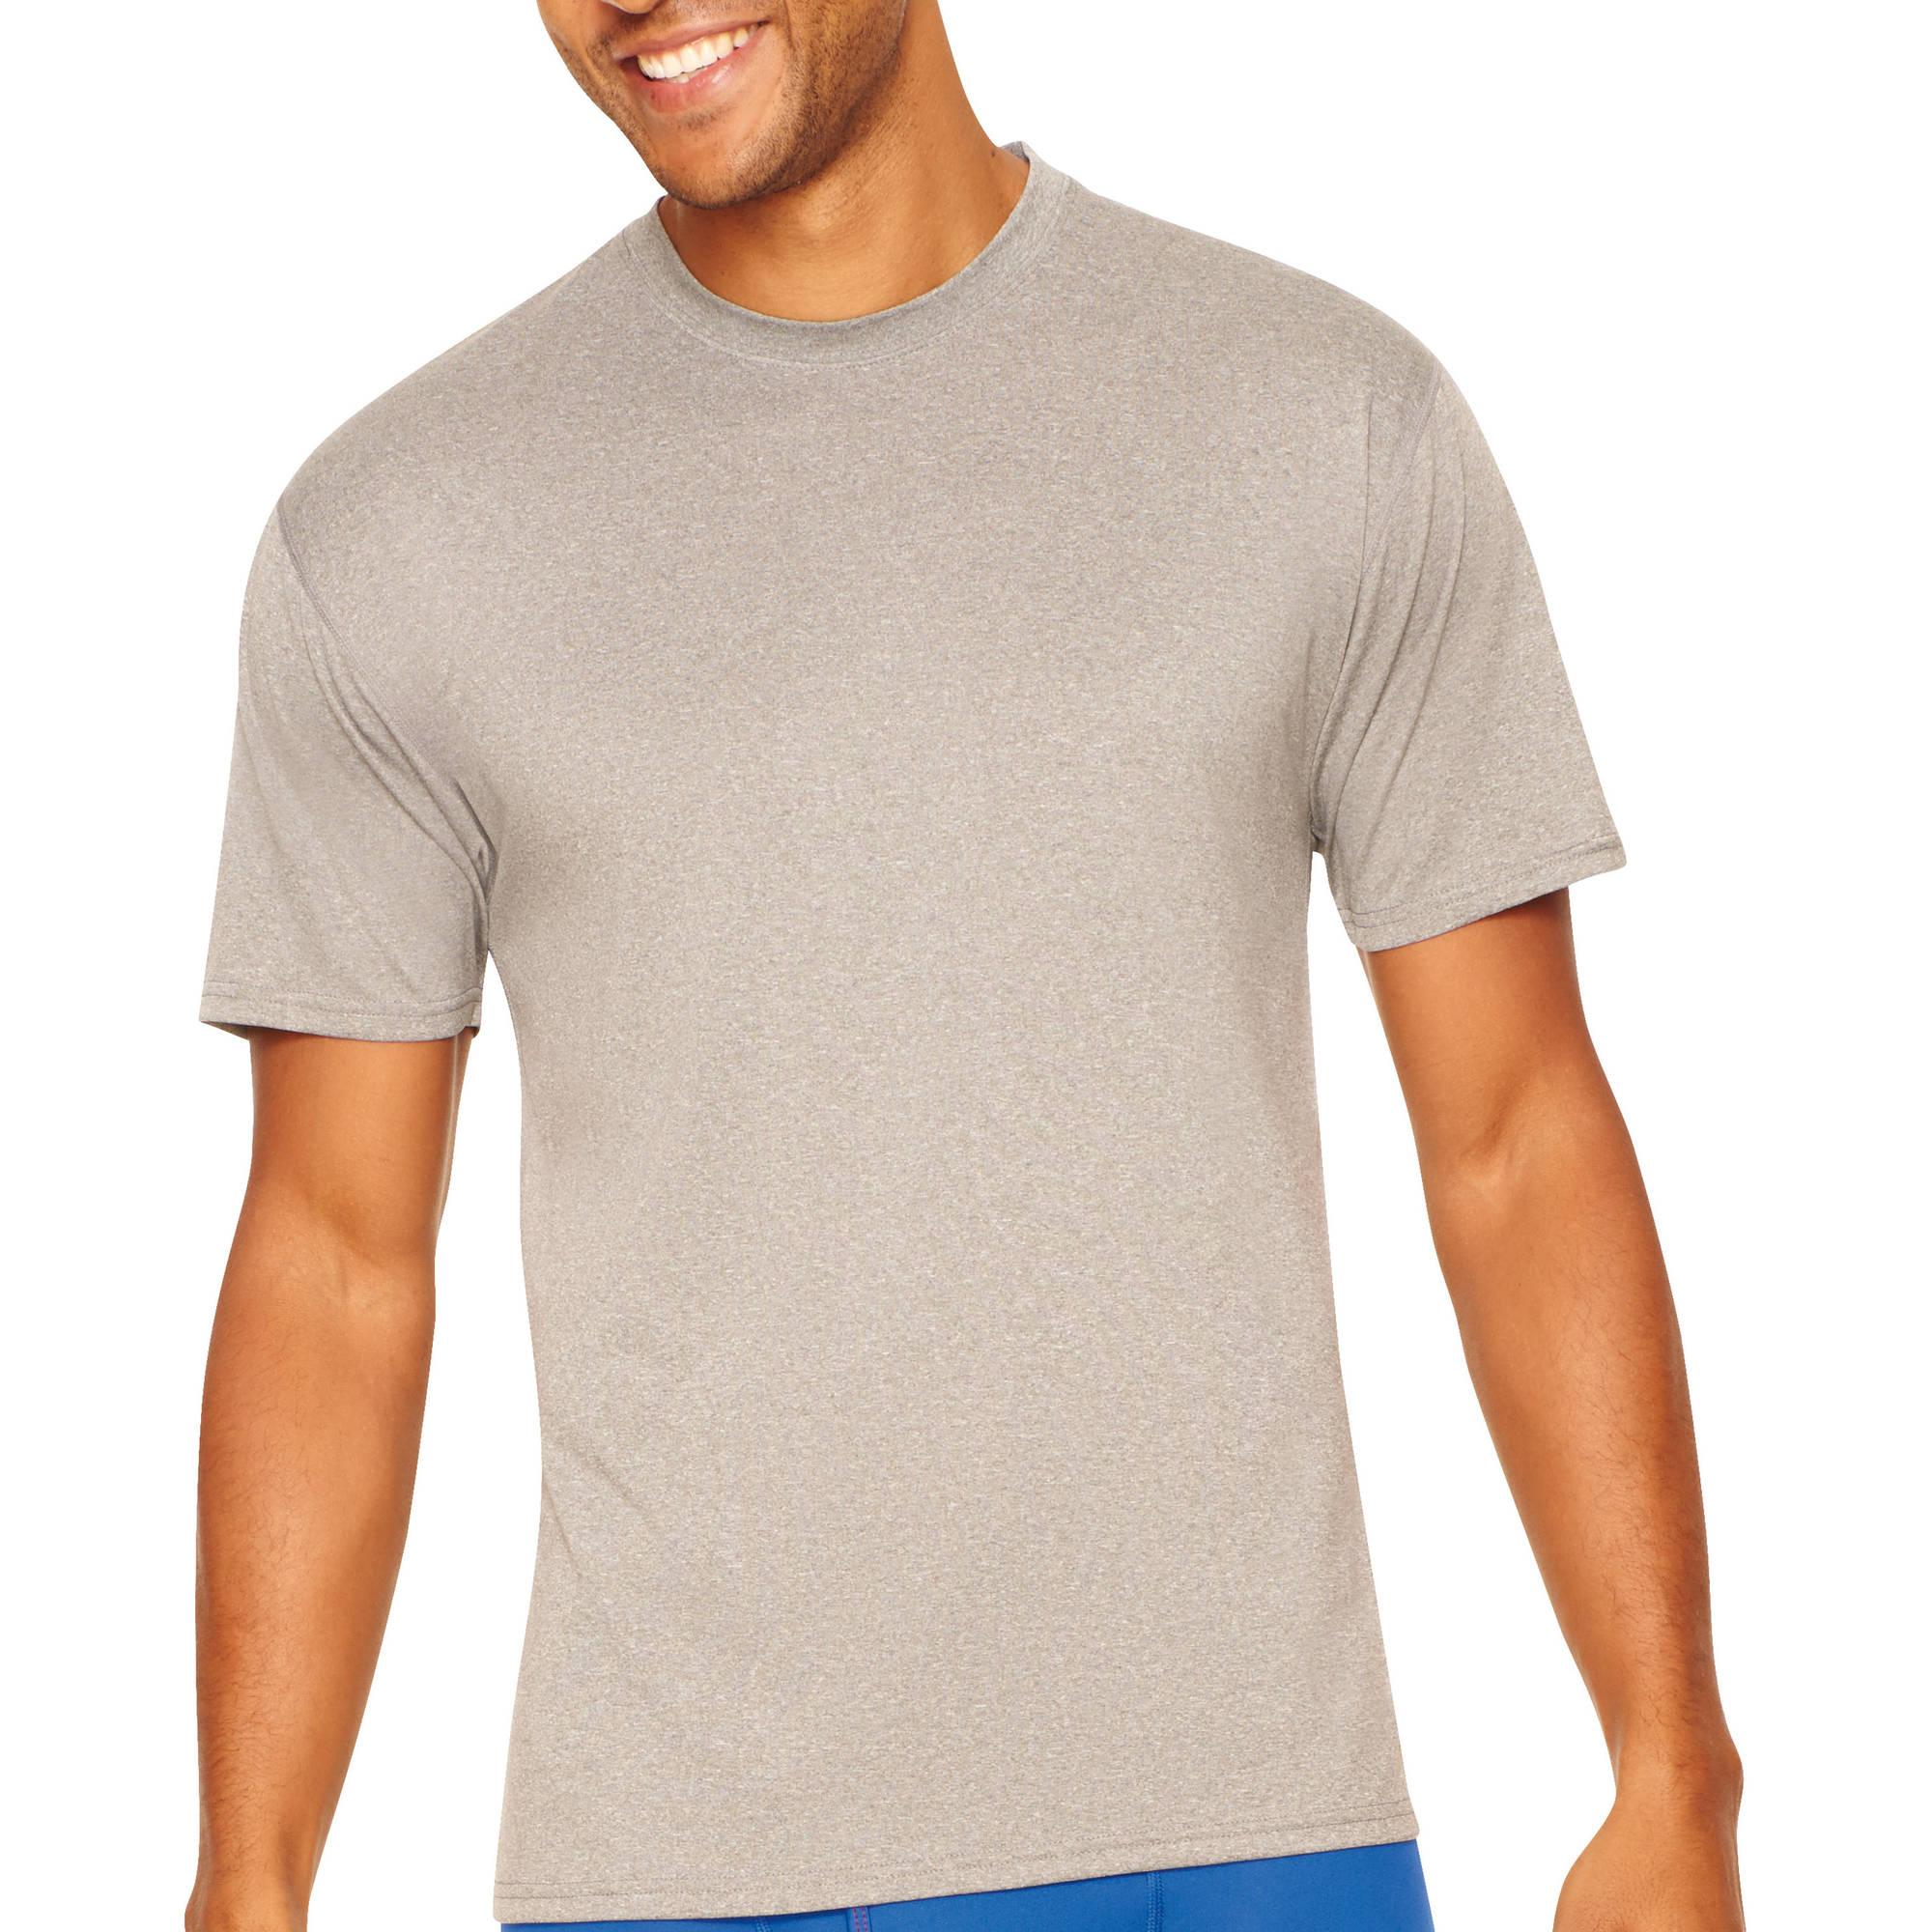 Hanes Men's X-Temp Performance Cool Crew T-Shirts, 2 Pack